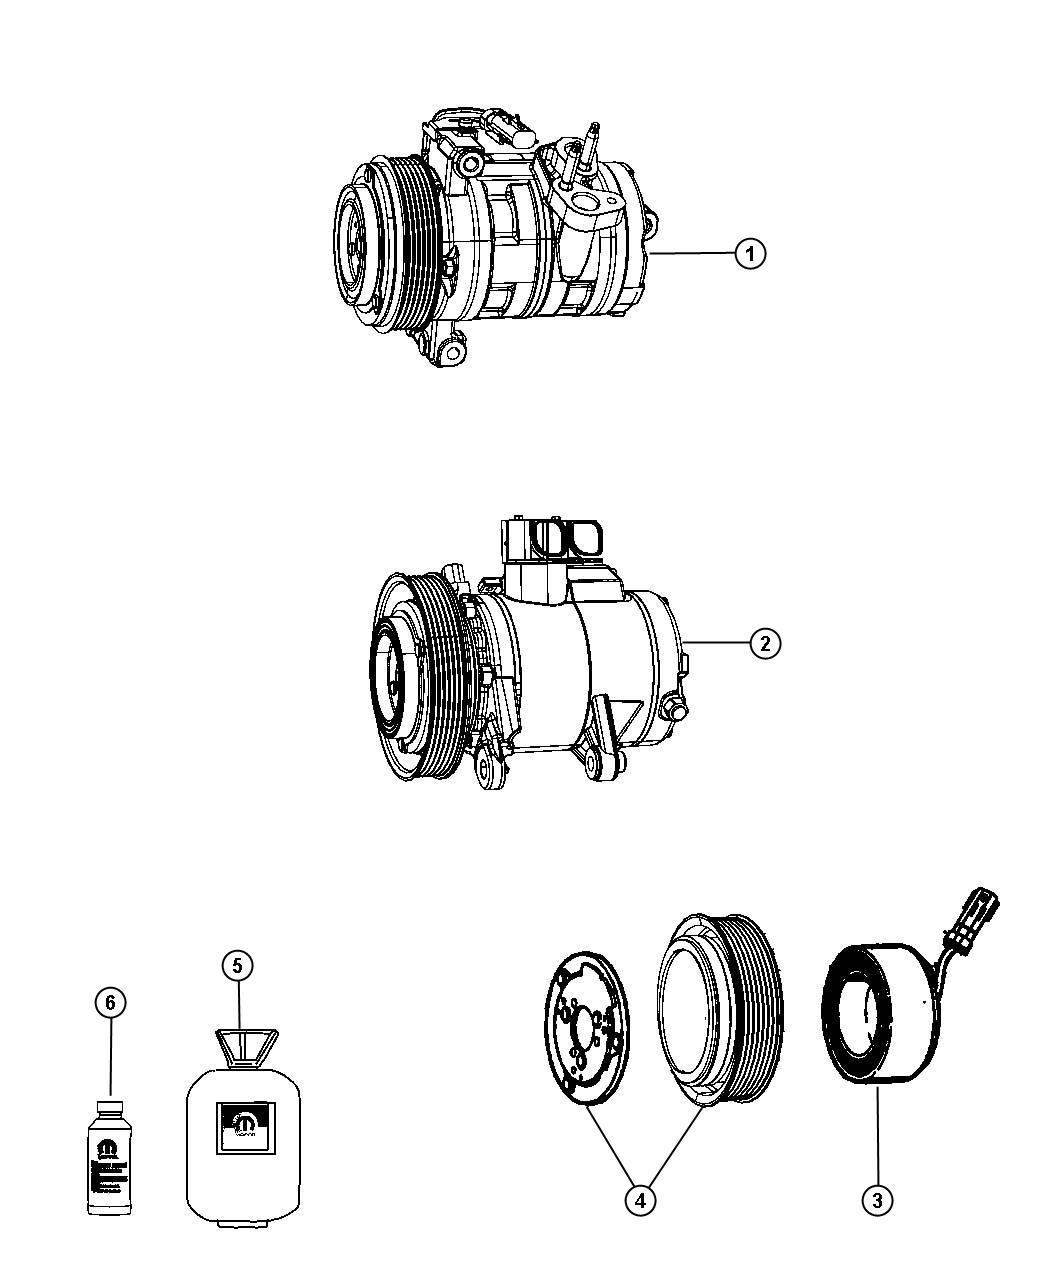 Jeep Liberty Compressor Air Conditioning